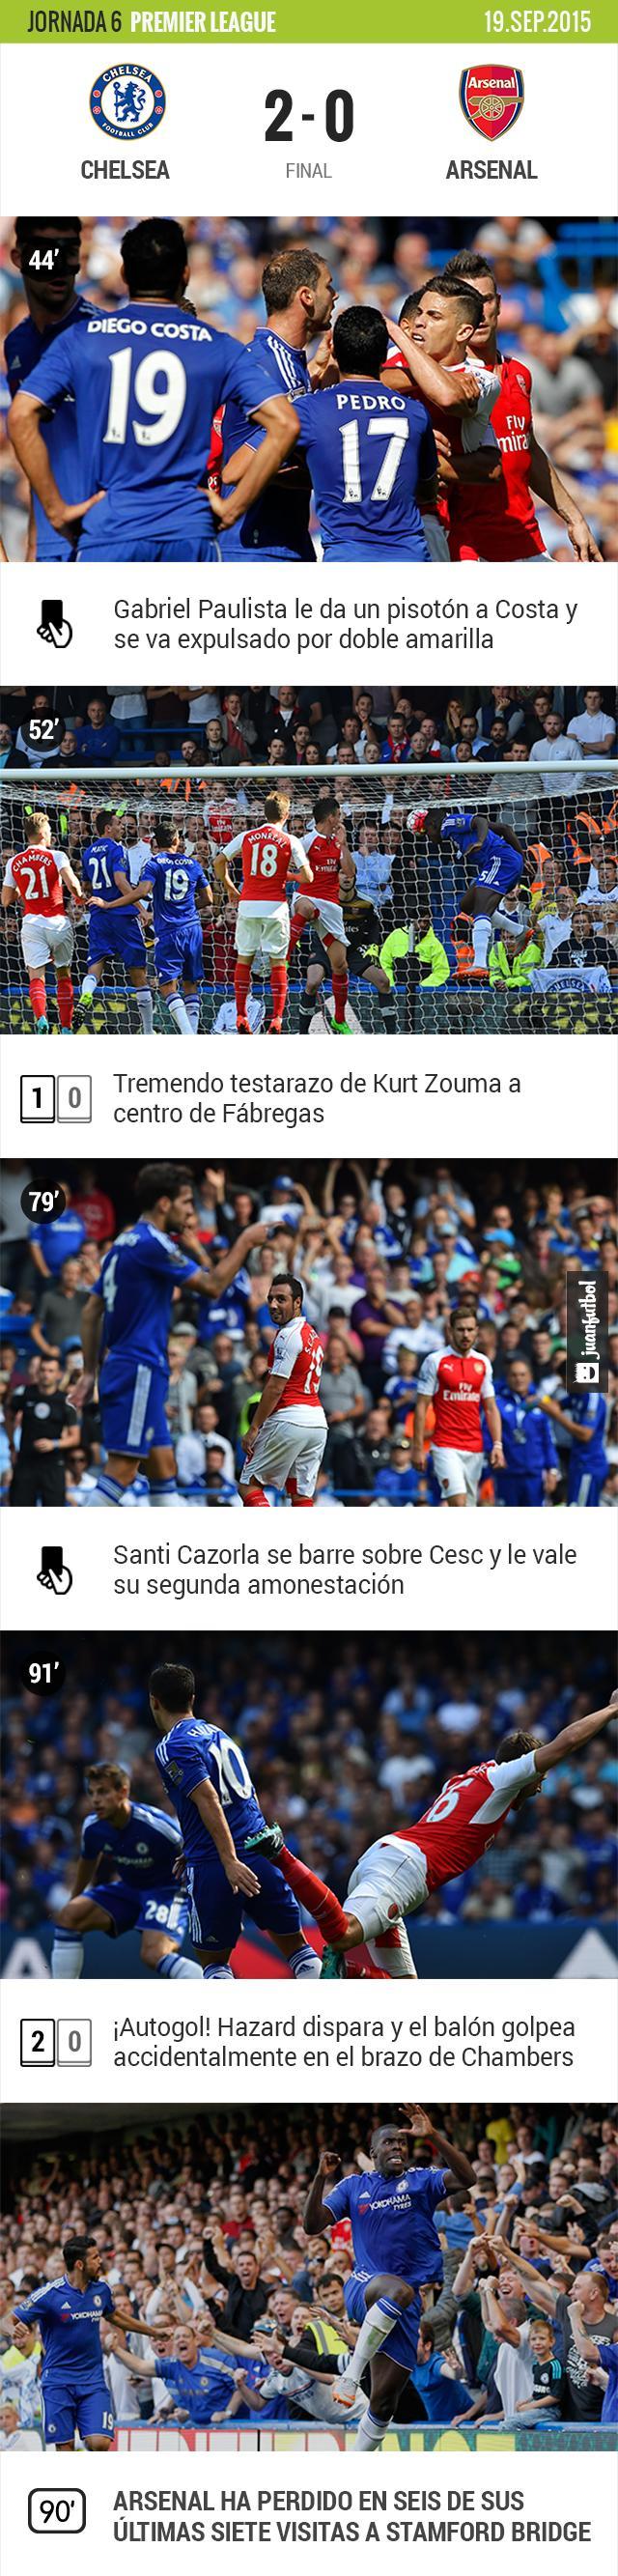 Chelsea vence 2-0 al Arsenal en Stamford Bridge